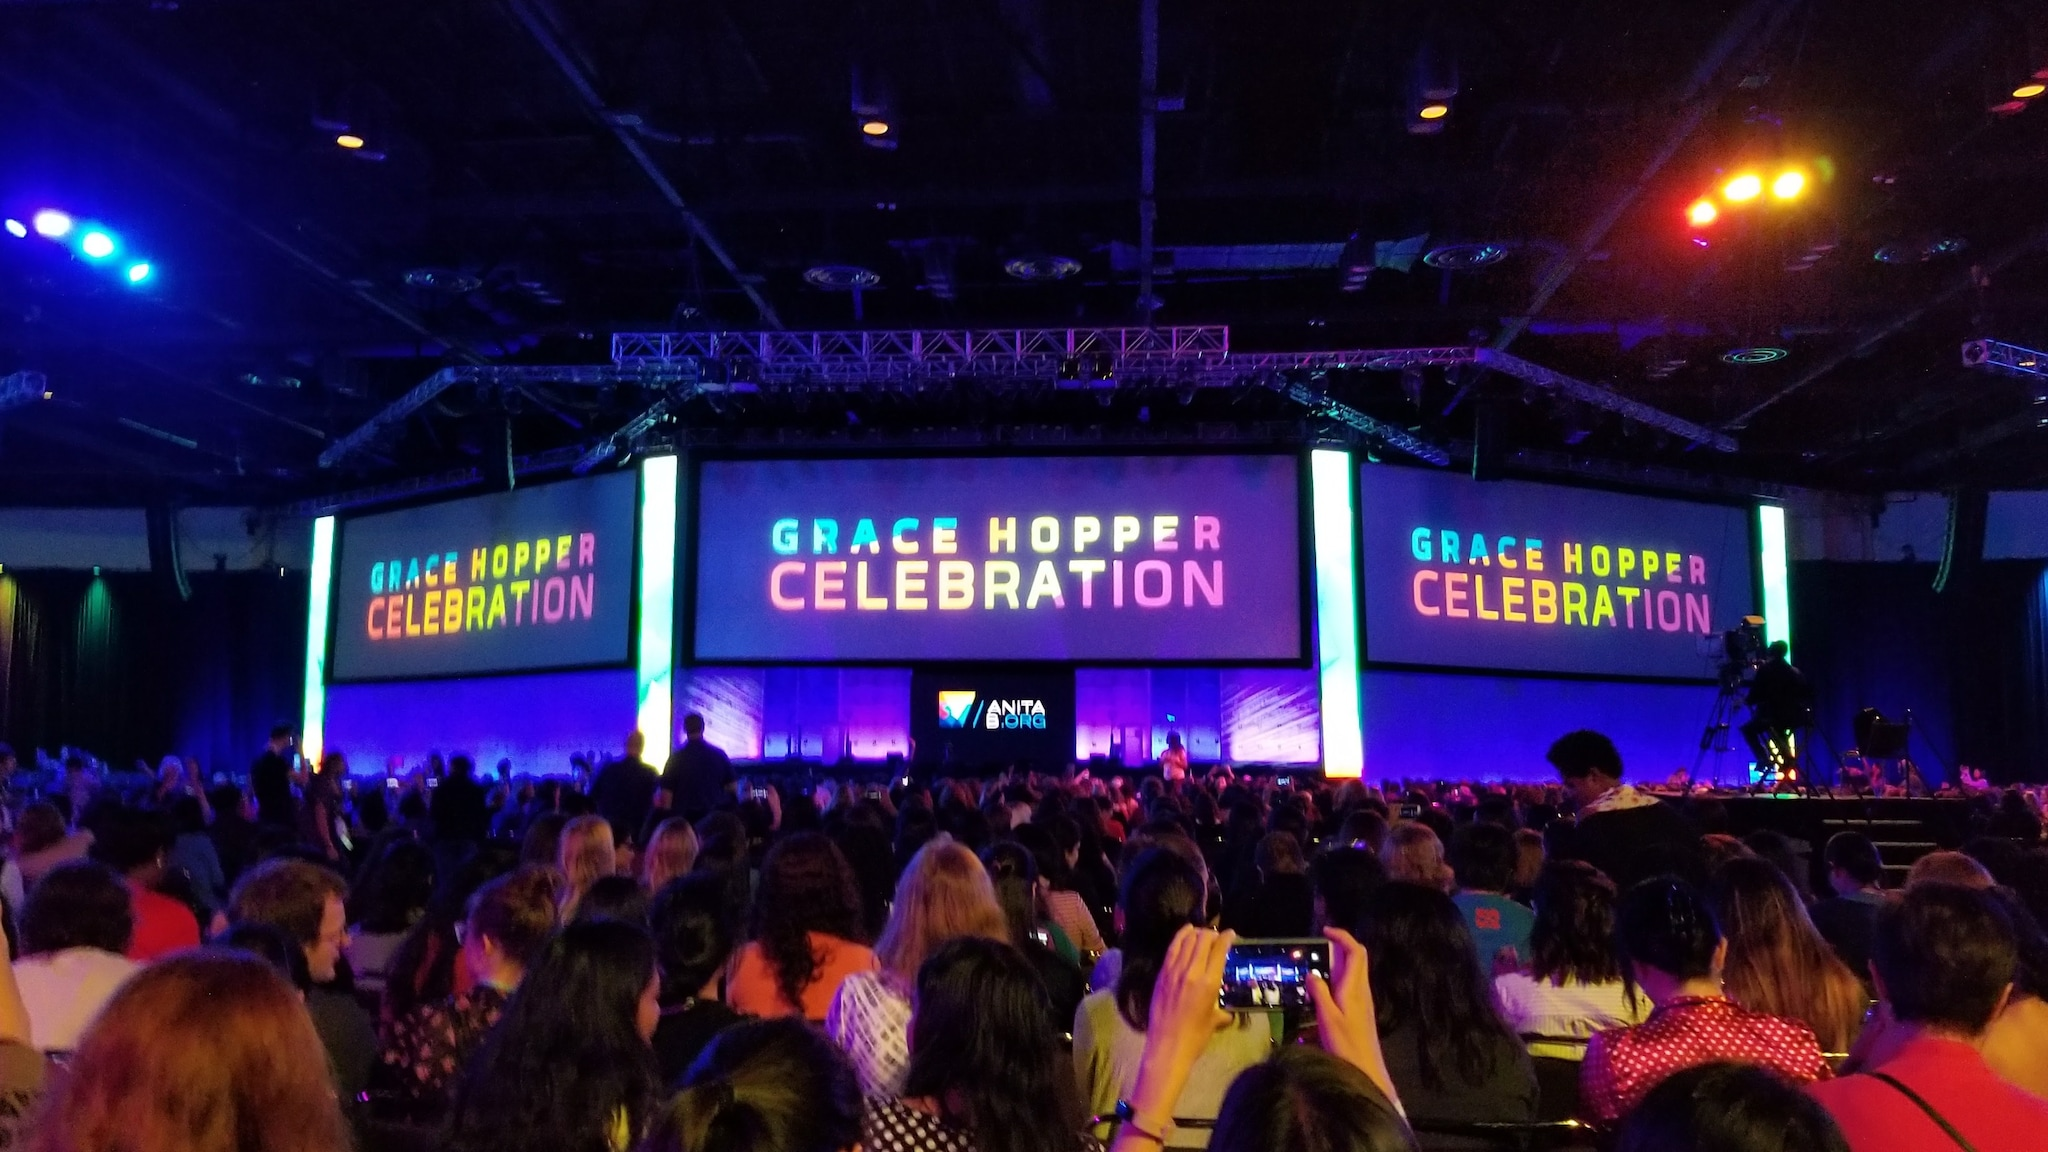 The Grace Hopper Celebration  >> Splunk At Grace Hopper Celebration 2017 More Than Just Recruiting